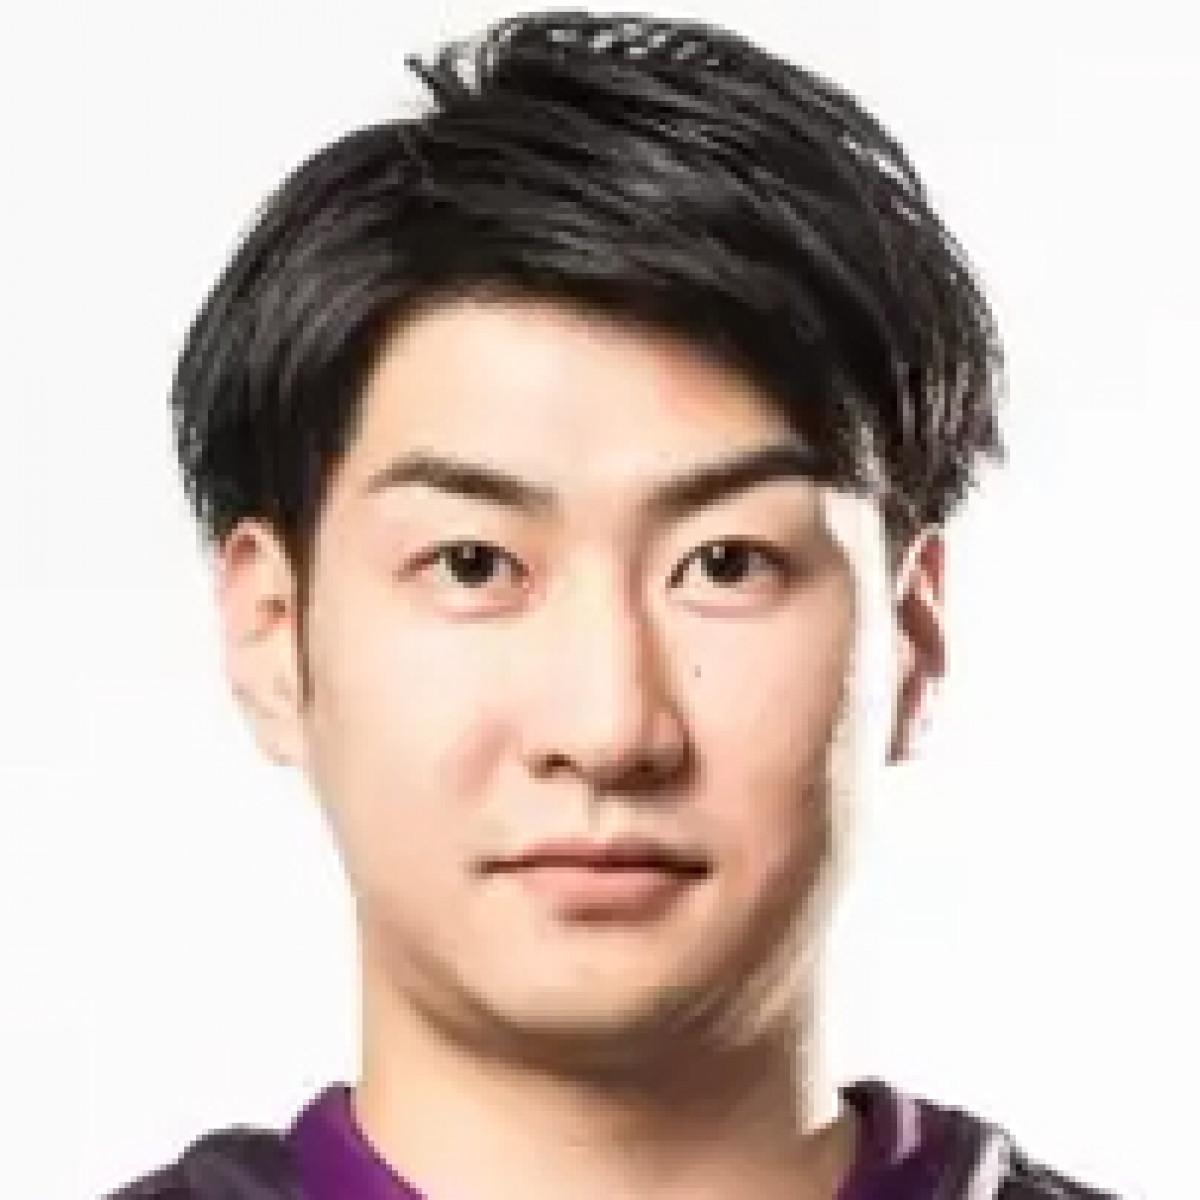 Ryota Iwata